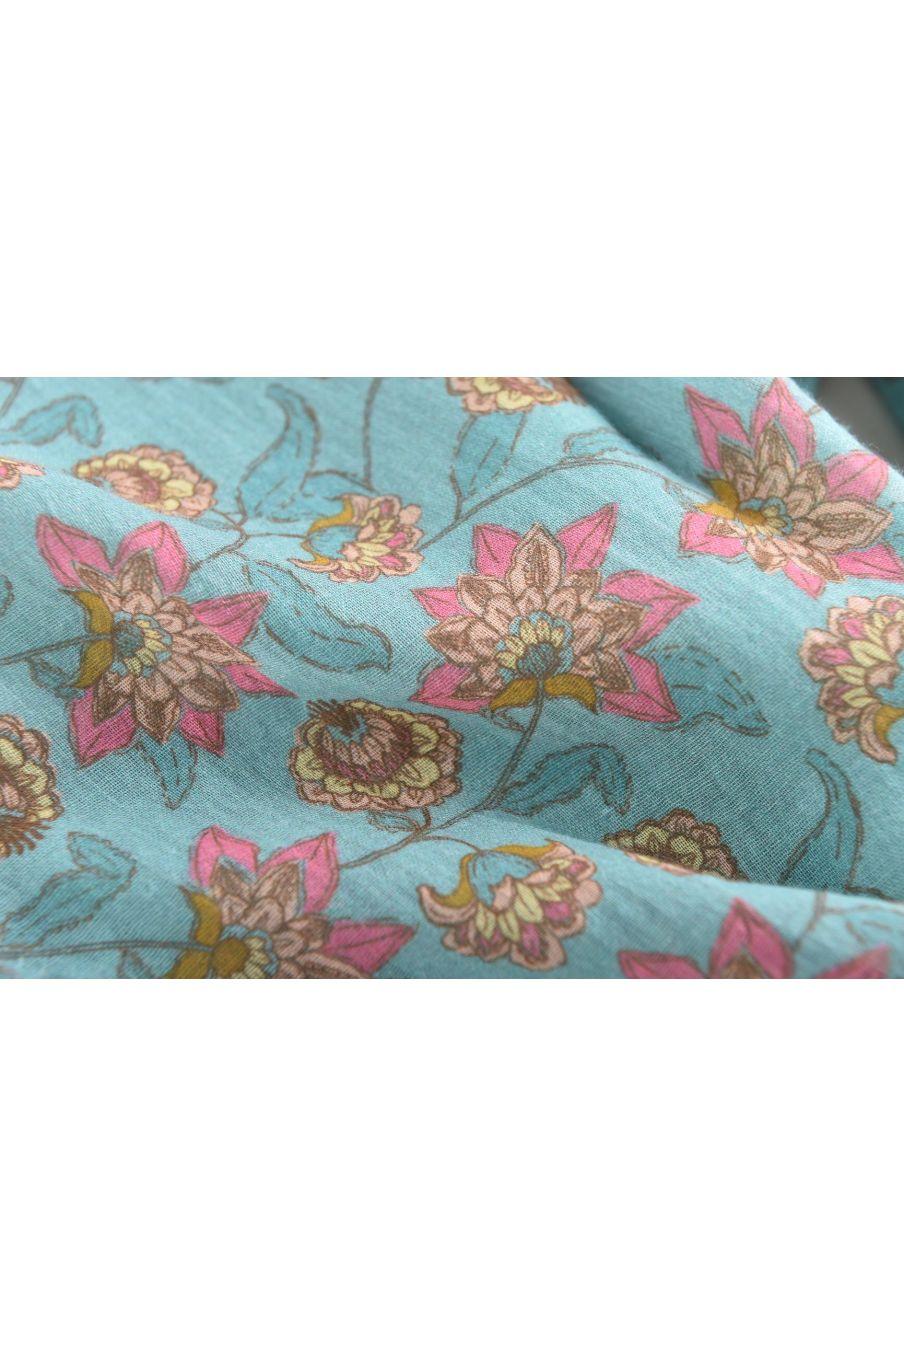 boheme chic vintage salopette fille talia turquoise flowers